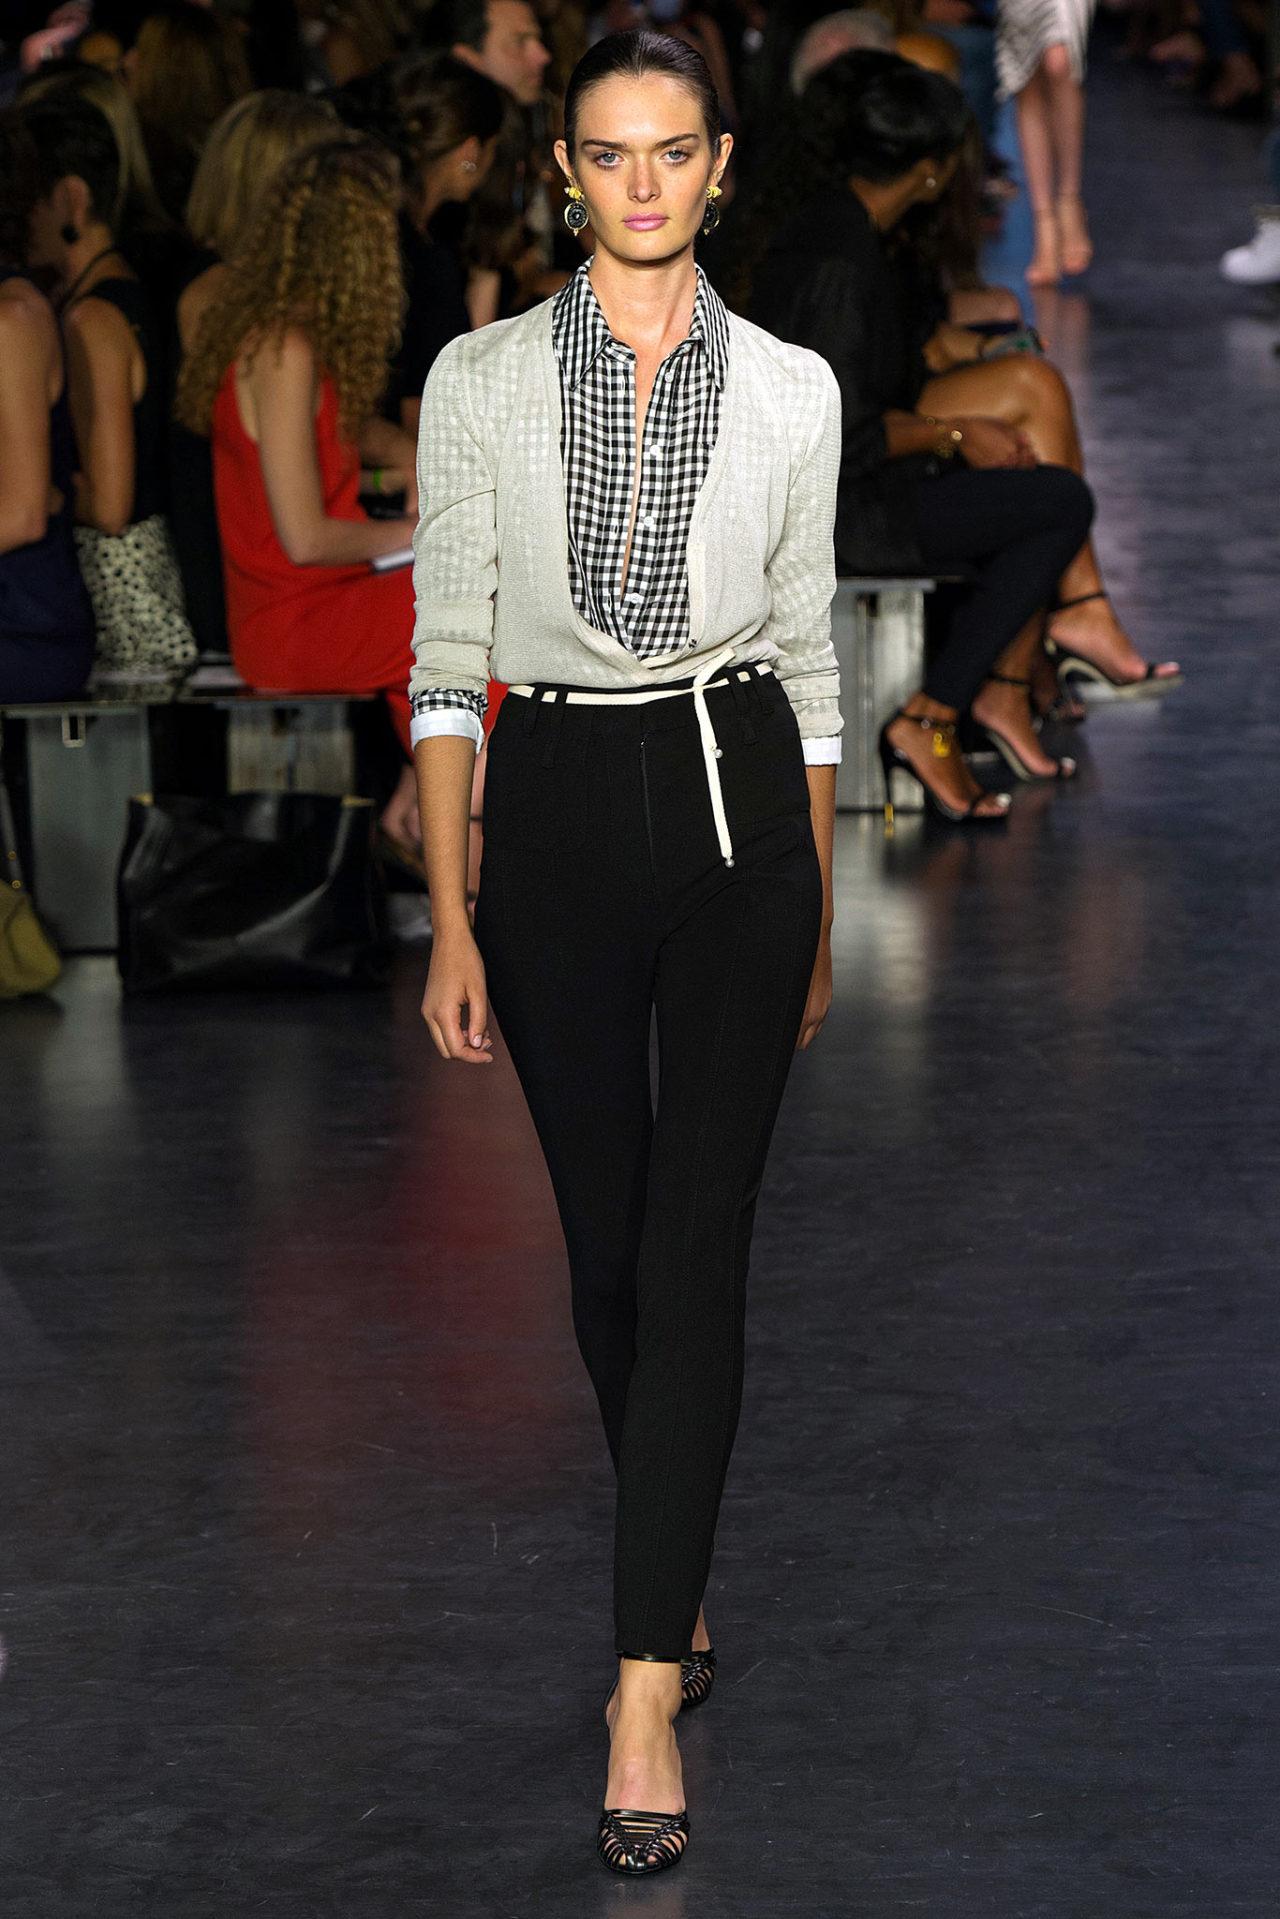 Altuzarra Spring 2015 RTW Fashion by Mademoiselle!(Runway blog!)